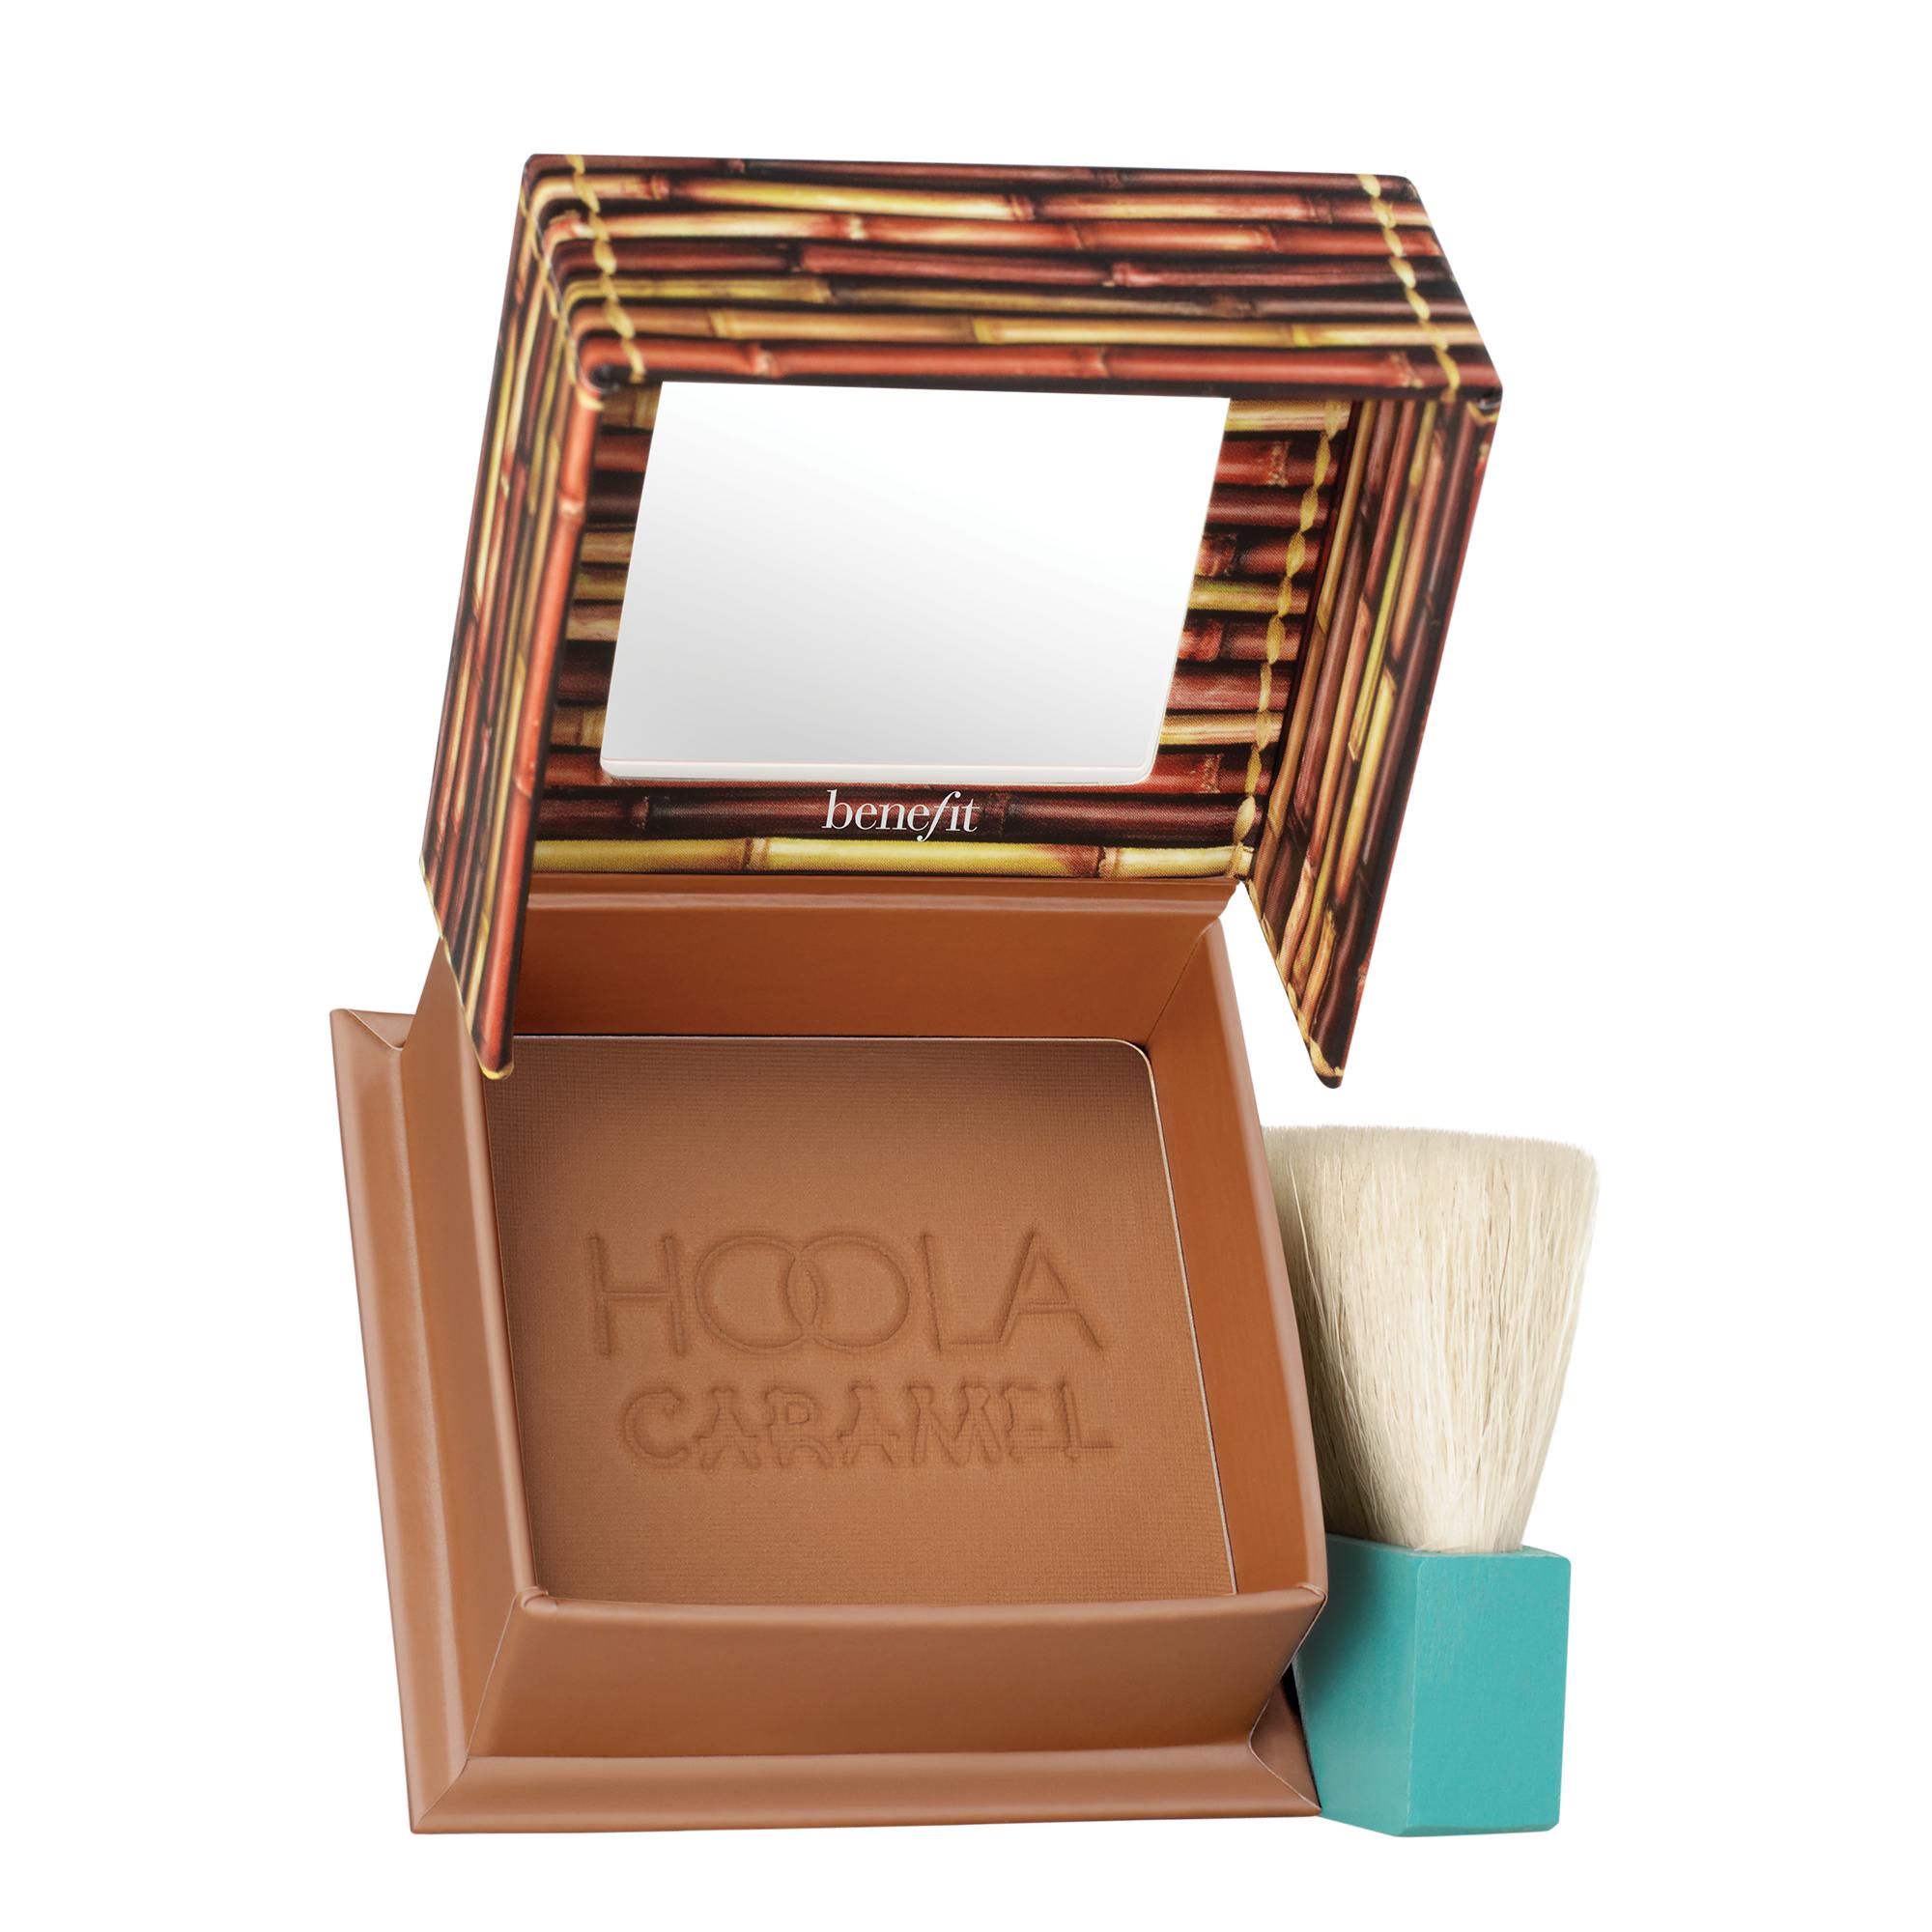 benefit-hoola-caramel.png